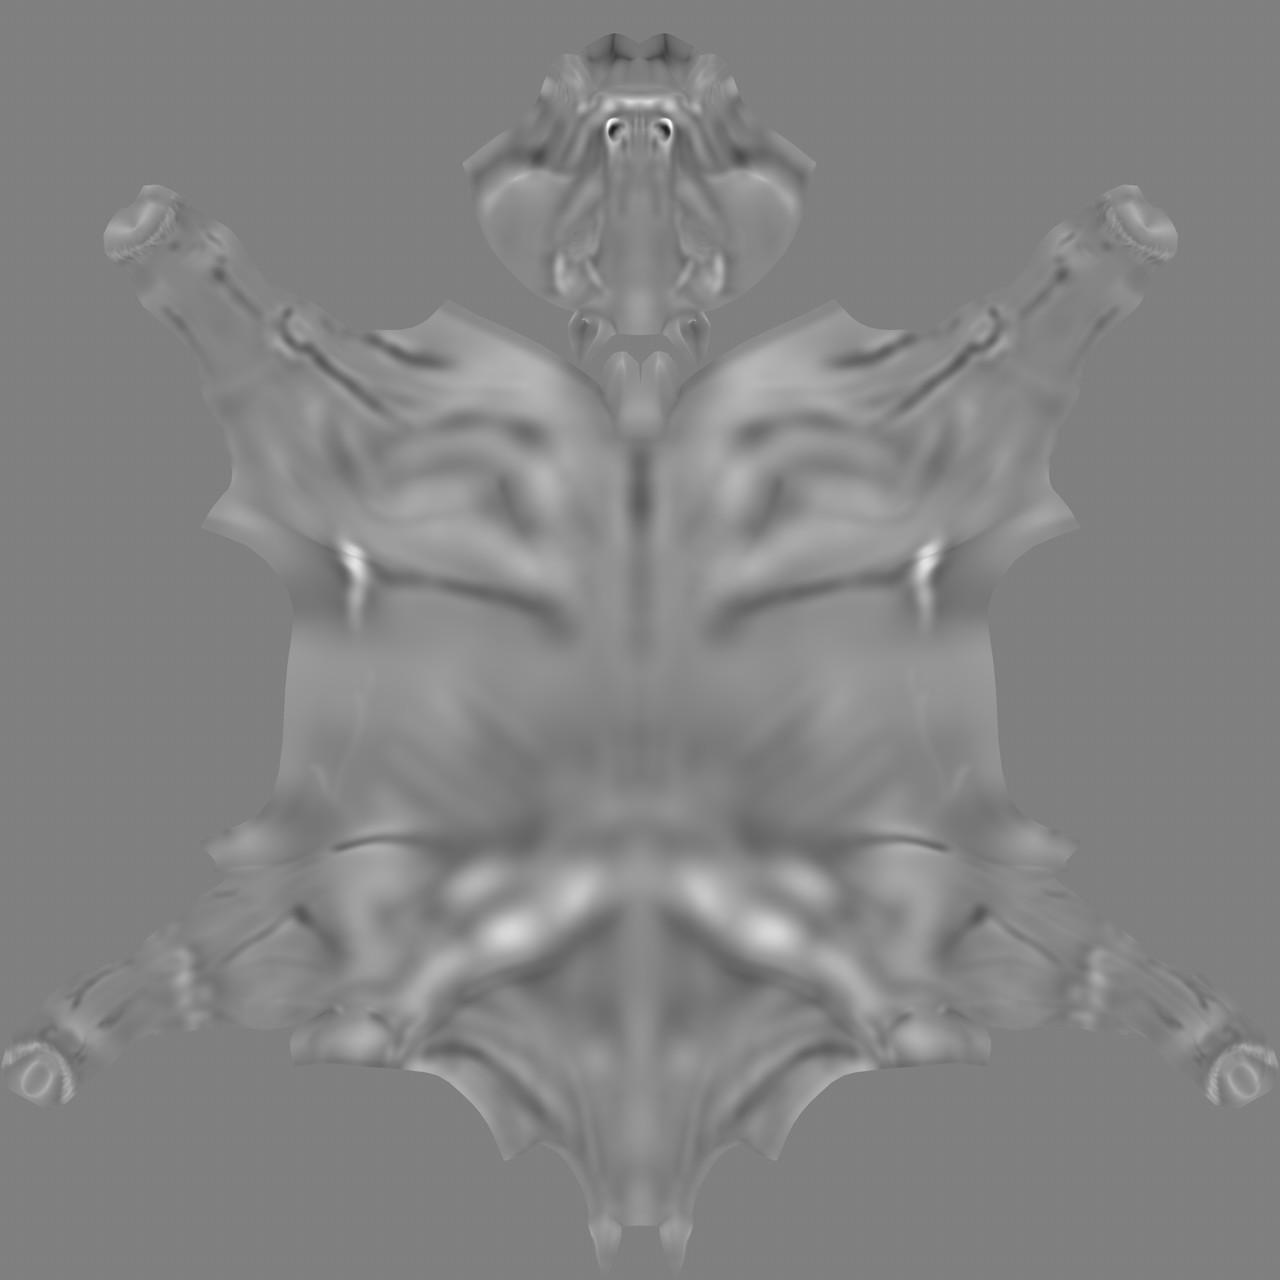 Marie sanginesi horse v013 zsculpt displacementmap v006